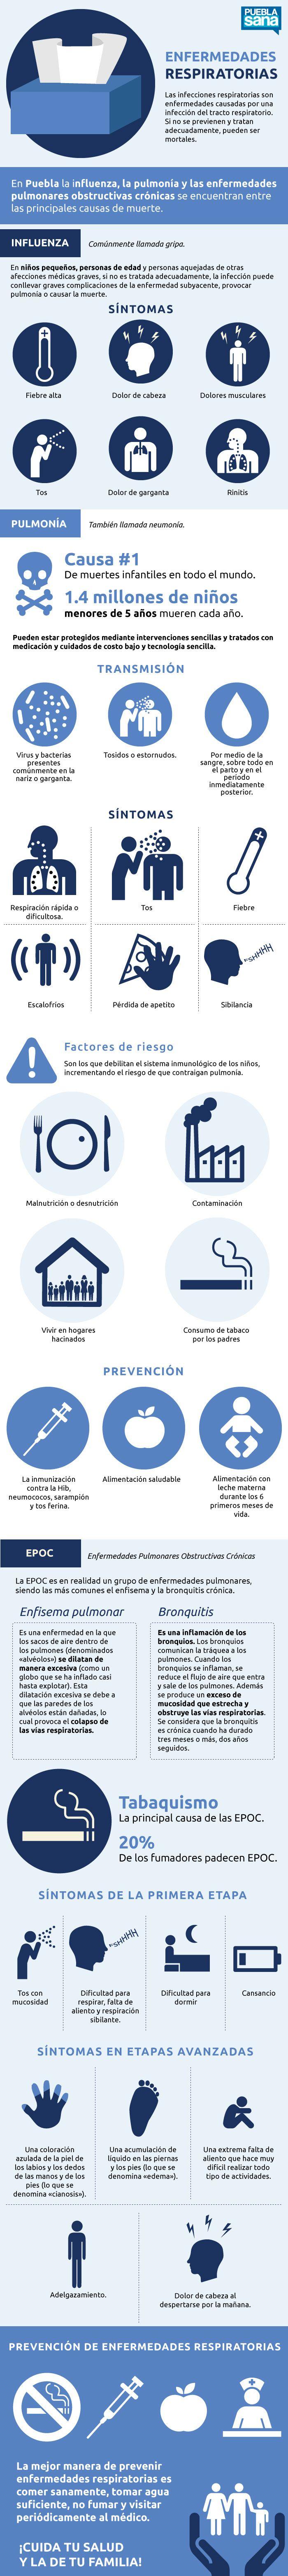 Enfermedades respiratorias, aprende a prevenirlas #PueblaSana